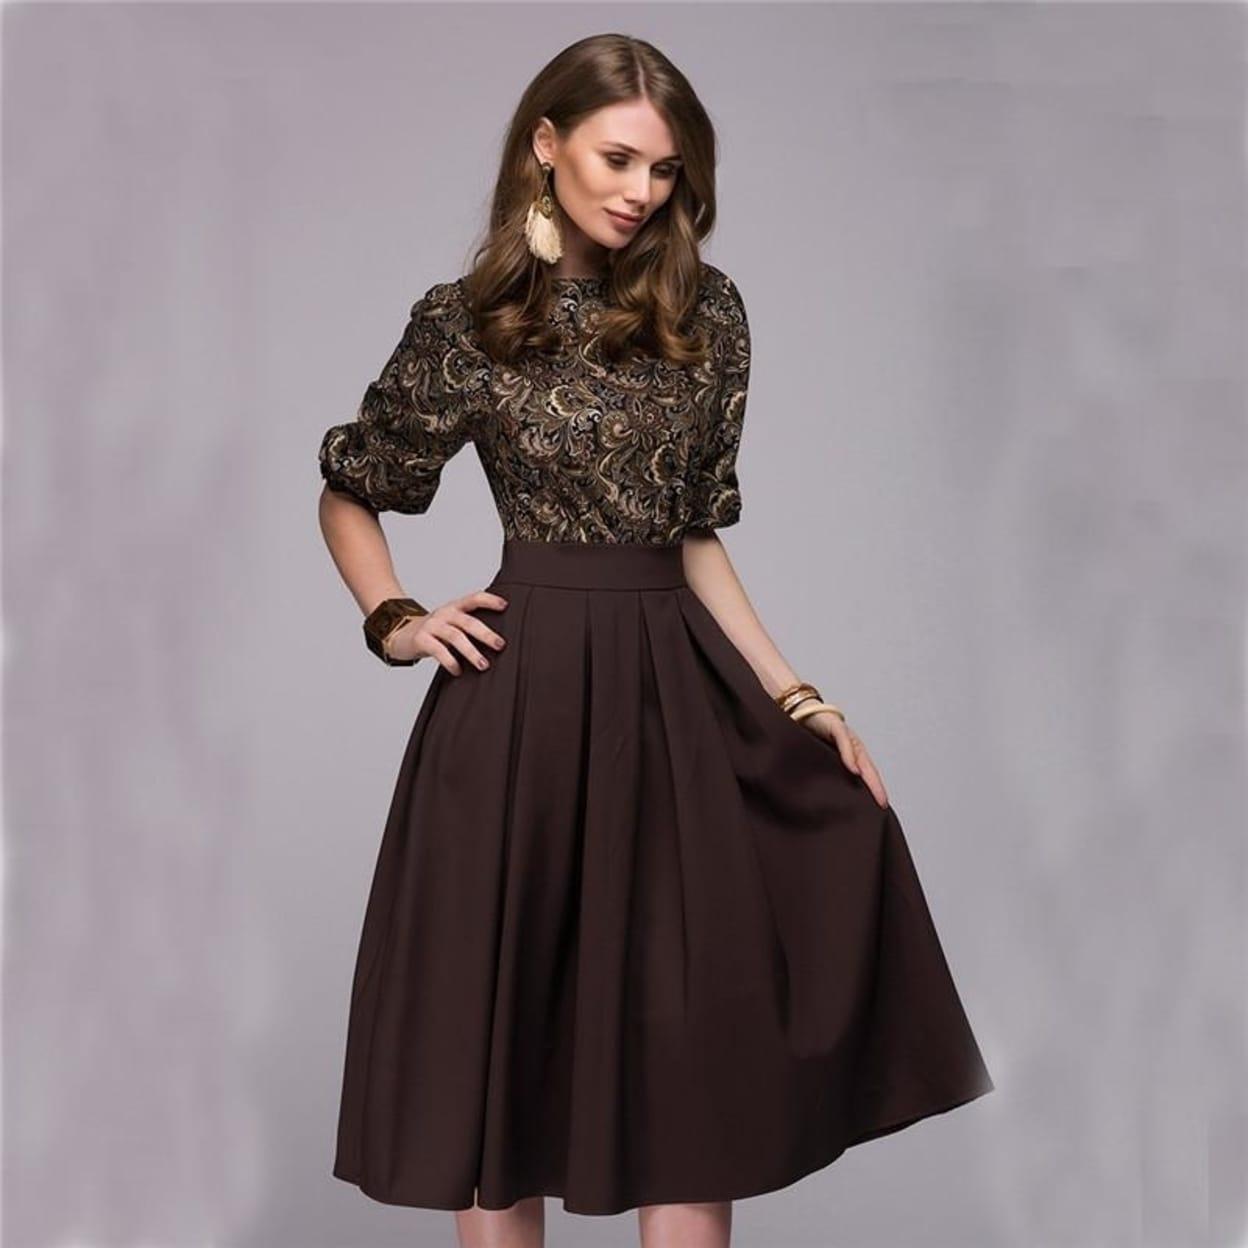 Fall Fashion Women Floral Printed Party Dresses Autumn Christmas Casual  Elegant Prom Midi Dress Plus Size